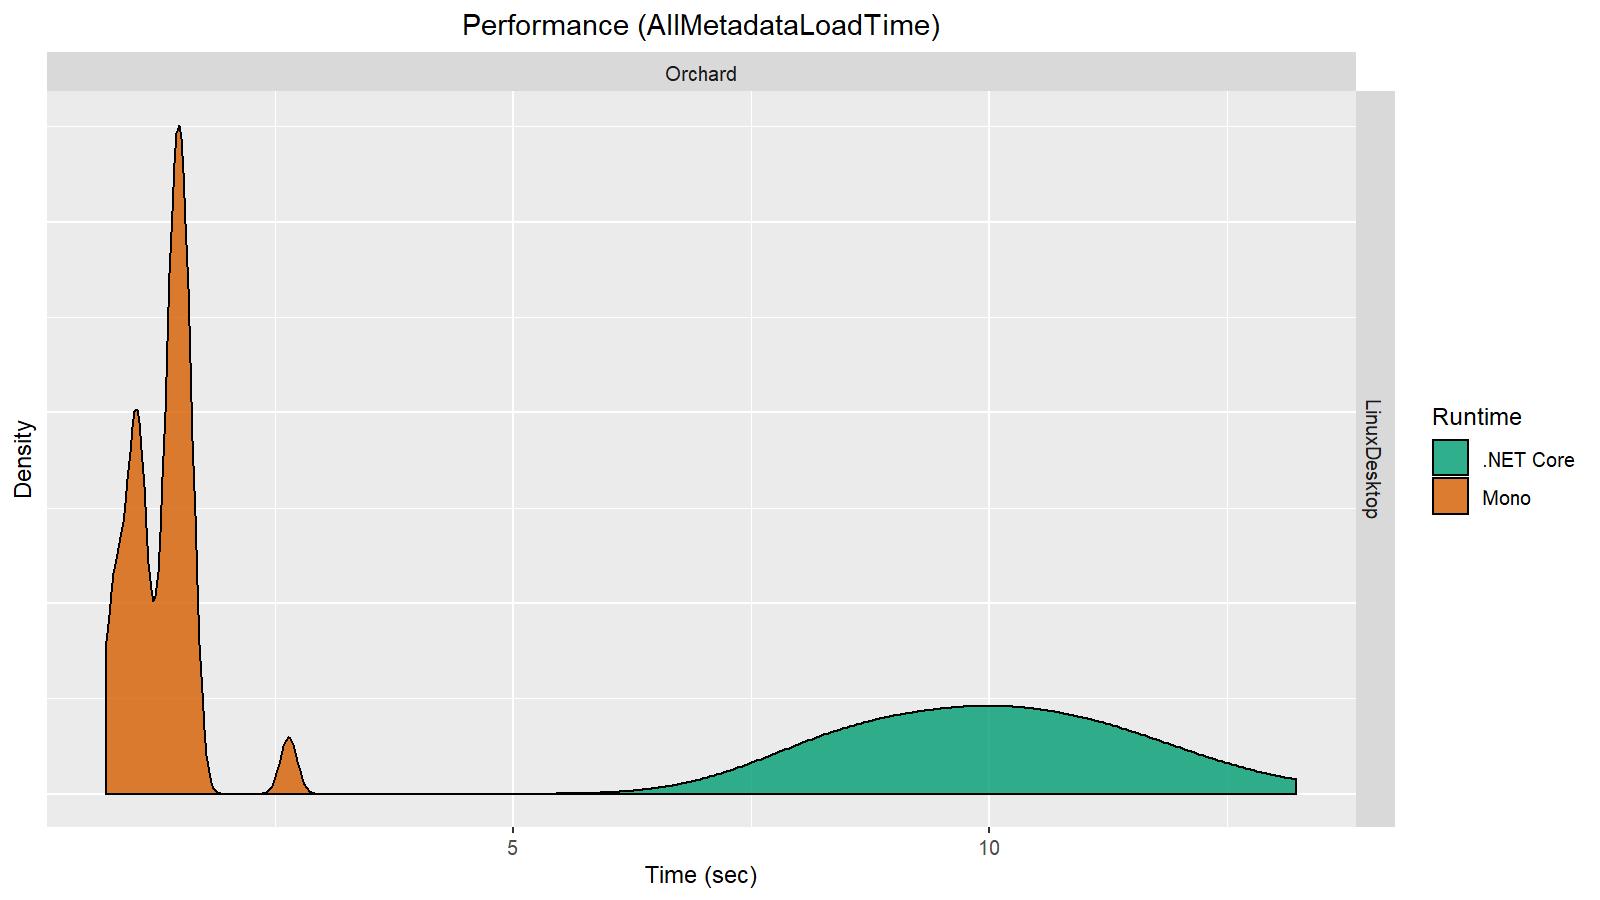 lin-perf-AllMetadataLoadTime